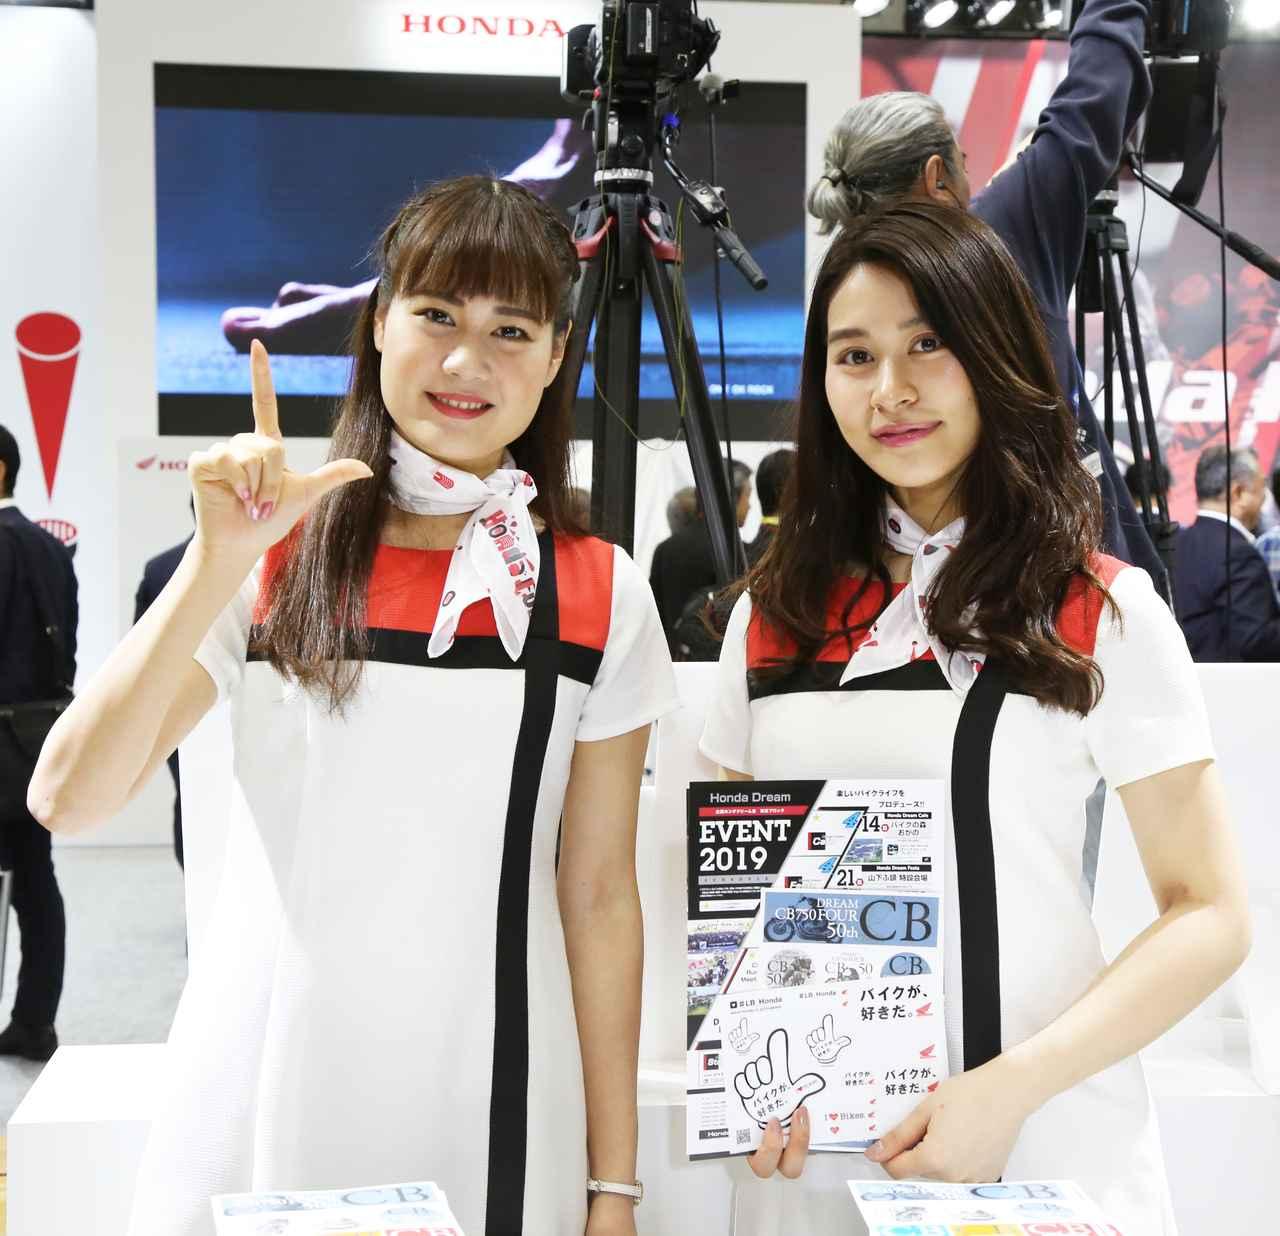 Images : 15番目の画像 - TMCS2019 美女コンパニオン図鑑! - webオートバイ